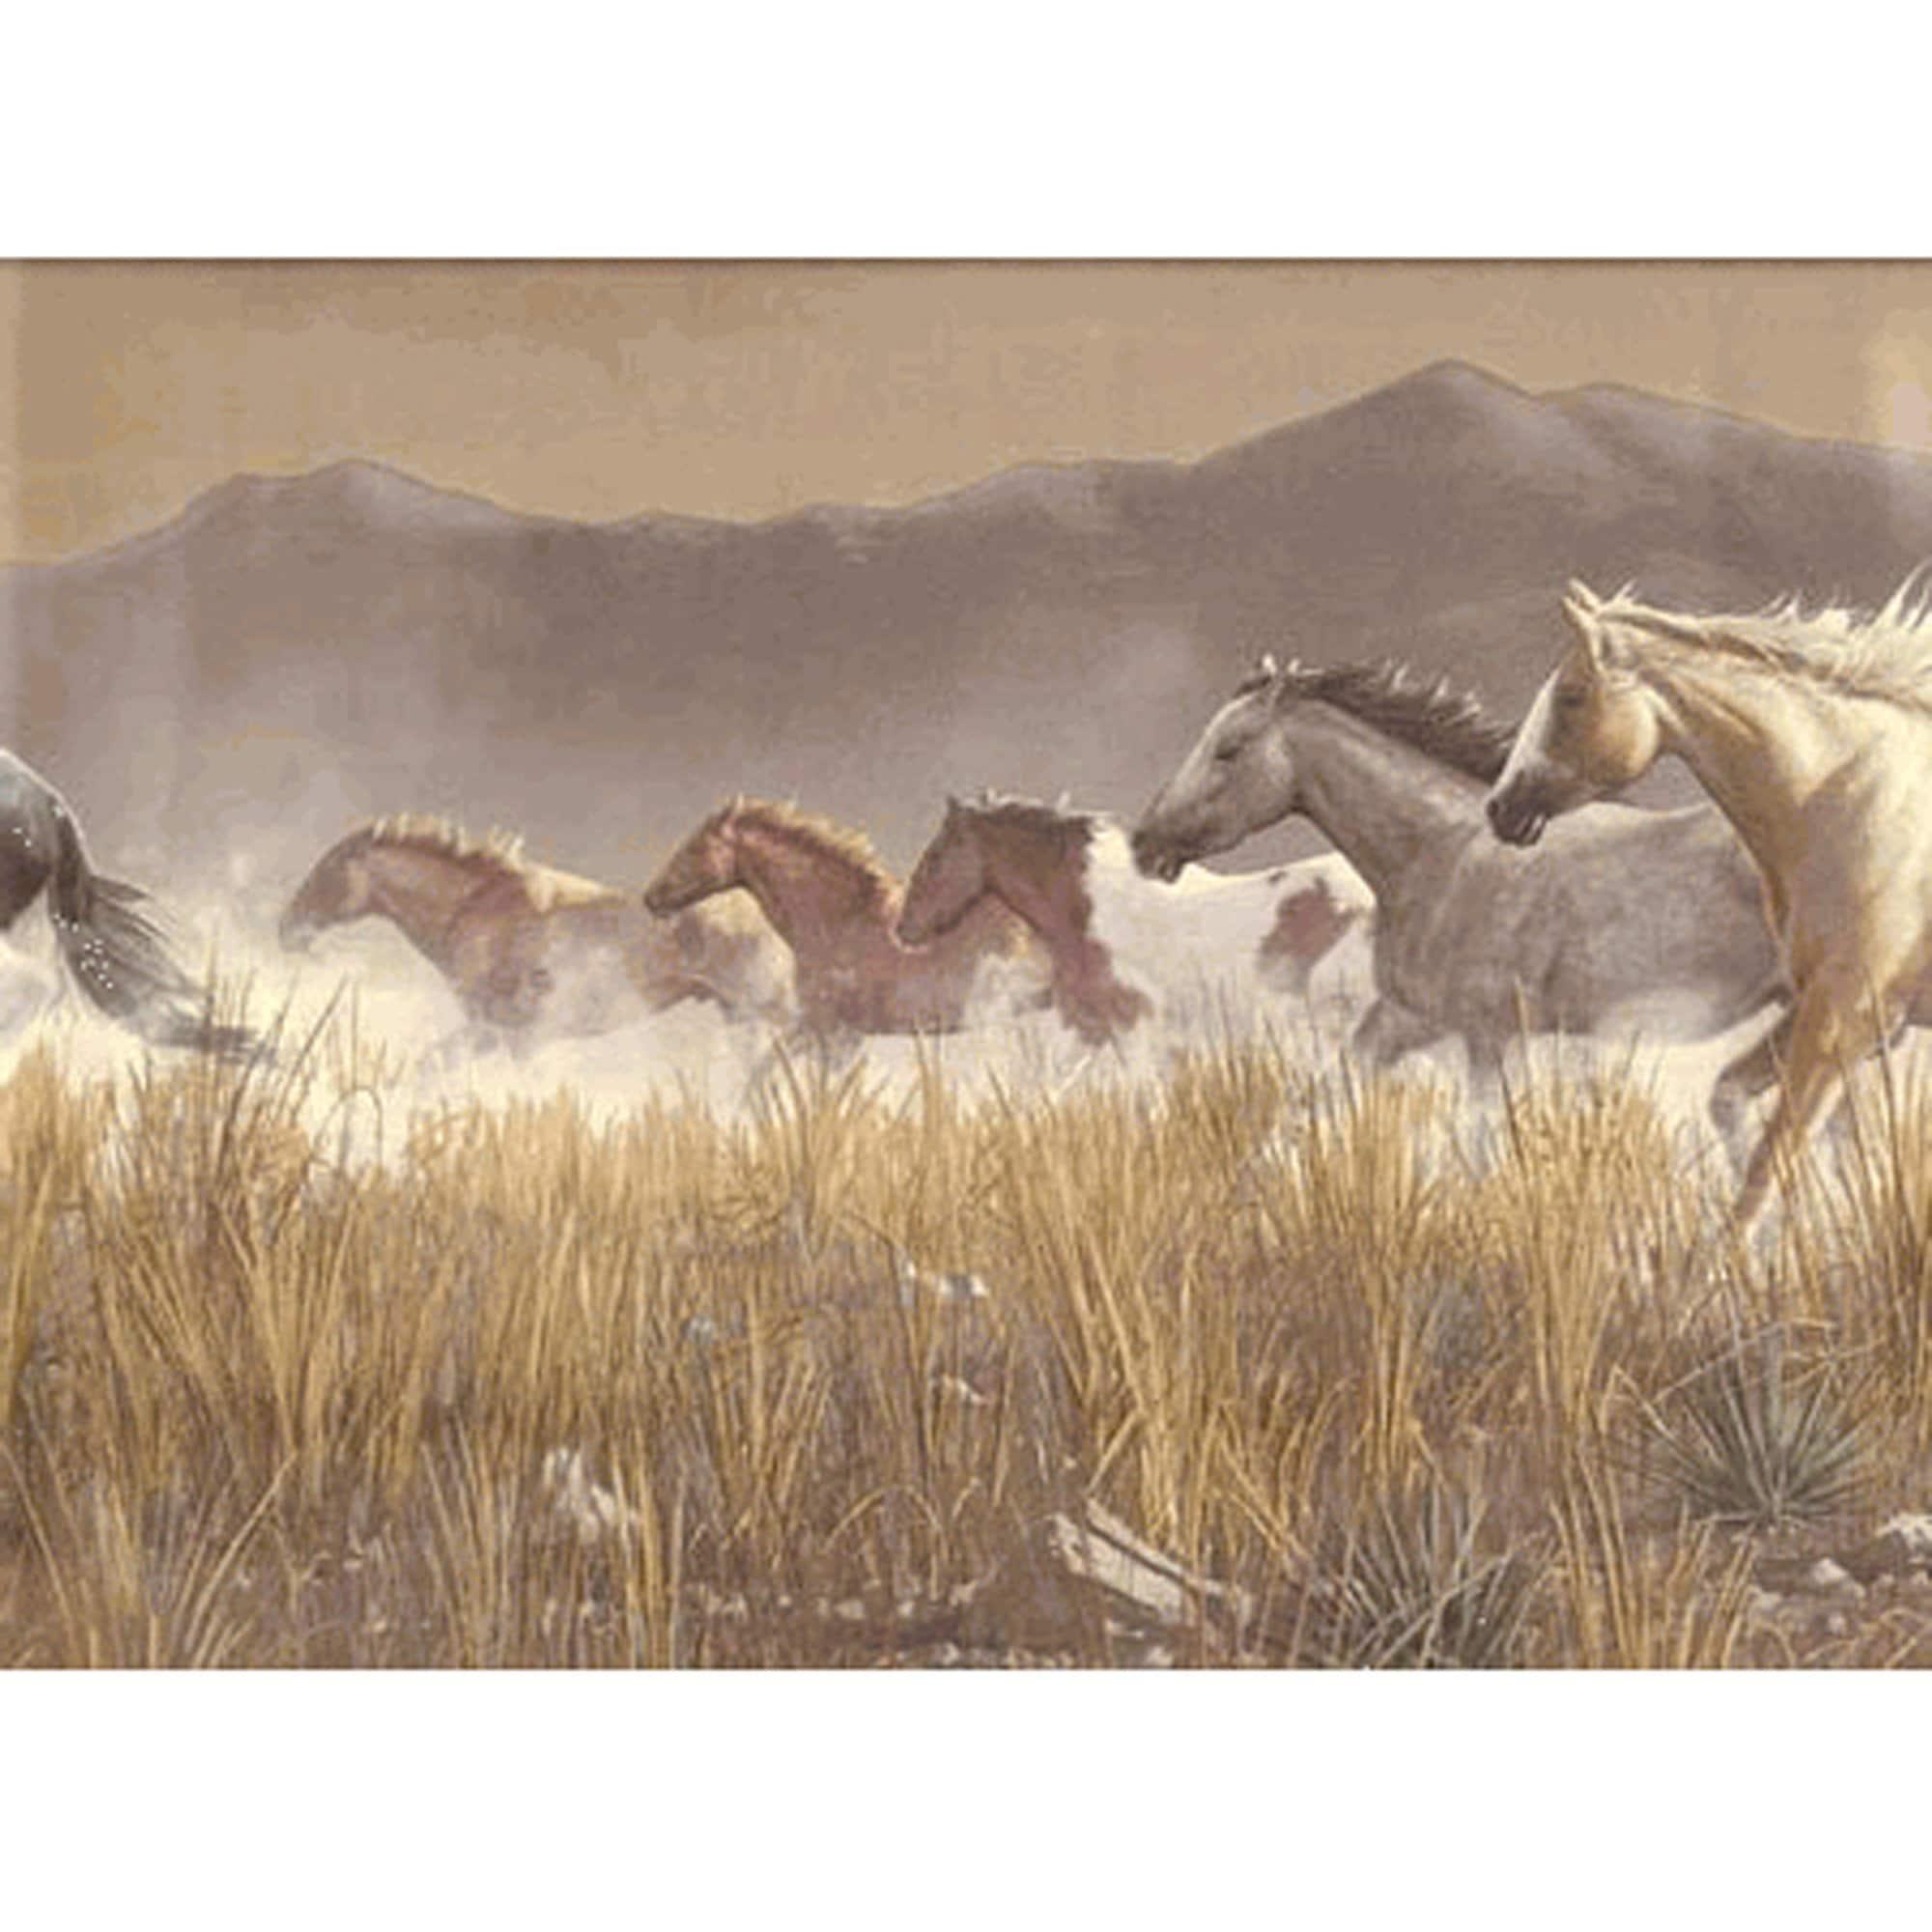 "Wallpaper Border - Seabrook Designs Wild Horses, Hautman Brothers Views of Nature, Pattern HG519B, 10 1/4"" x 5 Yds, Vinyl Pre-pasted"